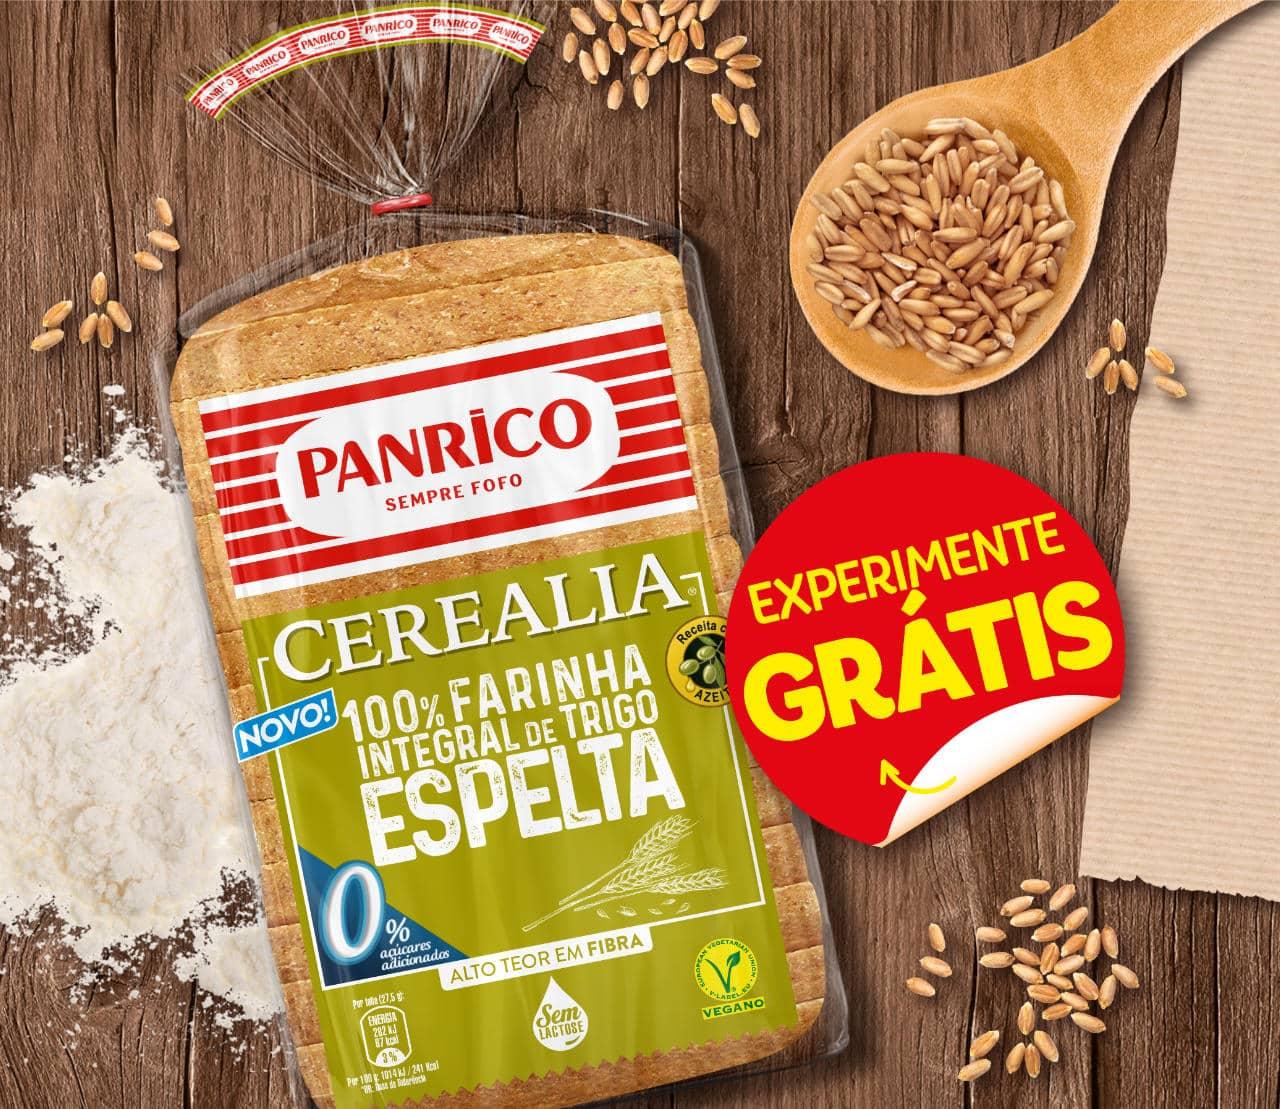 Panrico Cerealia 100% Farinha Espelta